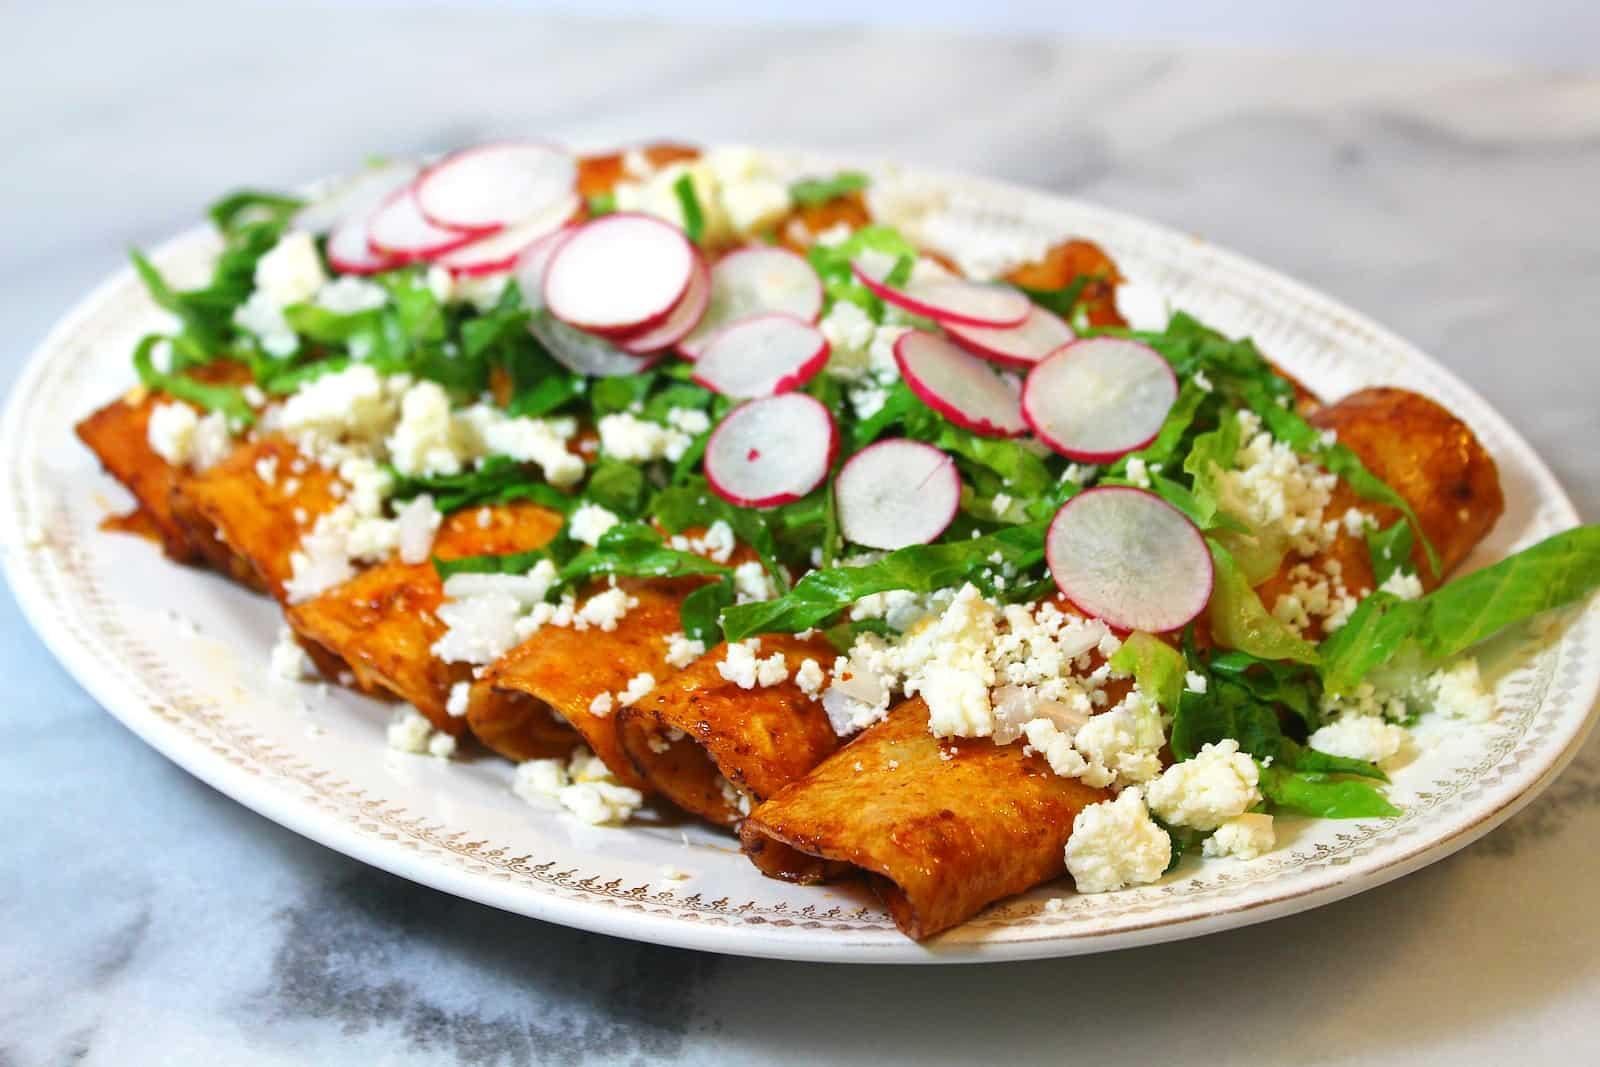 c243mo hacer enchiladas rojas recetas de comida mexicana